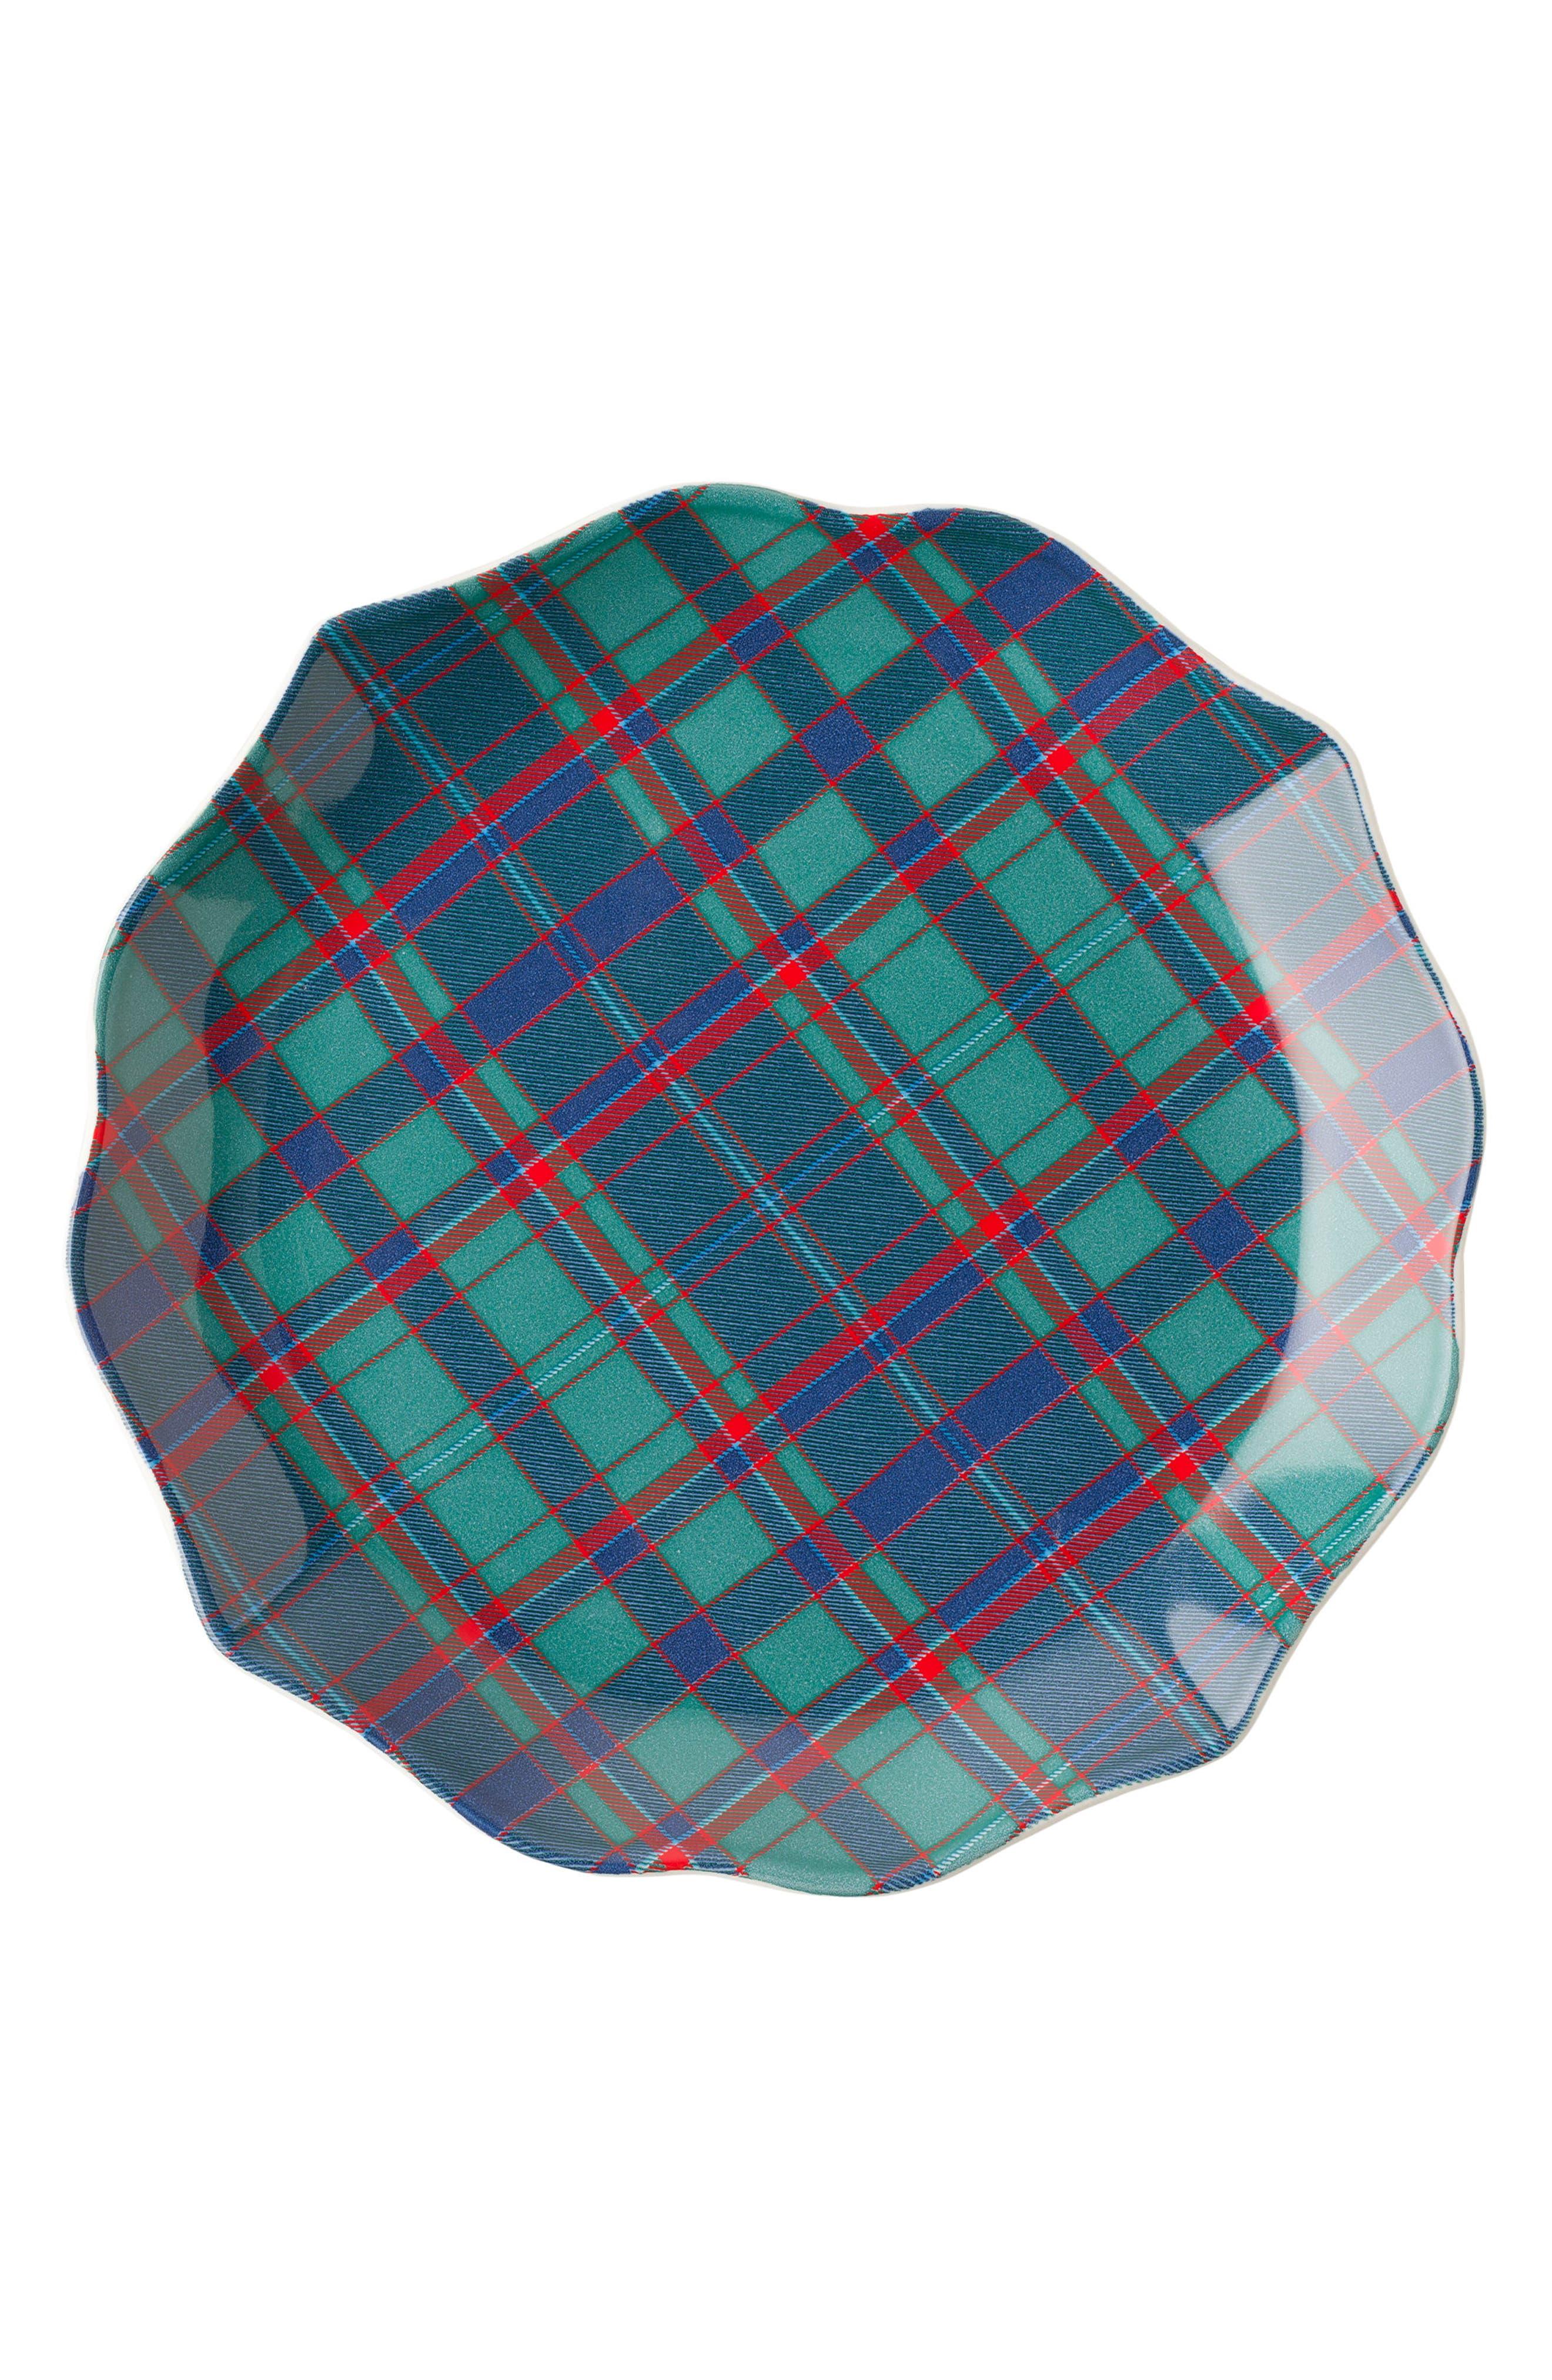 New Traditions - Tartan Tidbit Set of 4 Plates,                             Alternate thumbnail 5, color,                             400